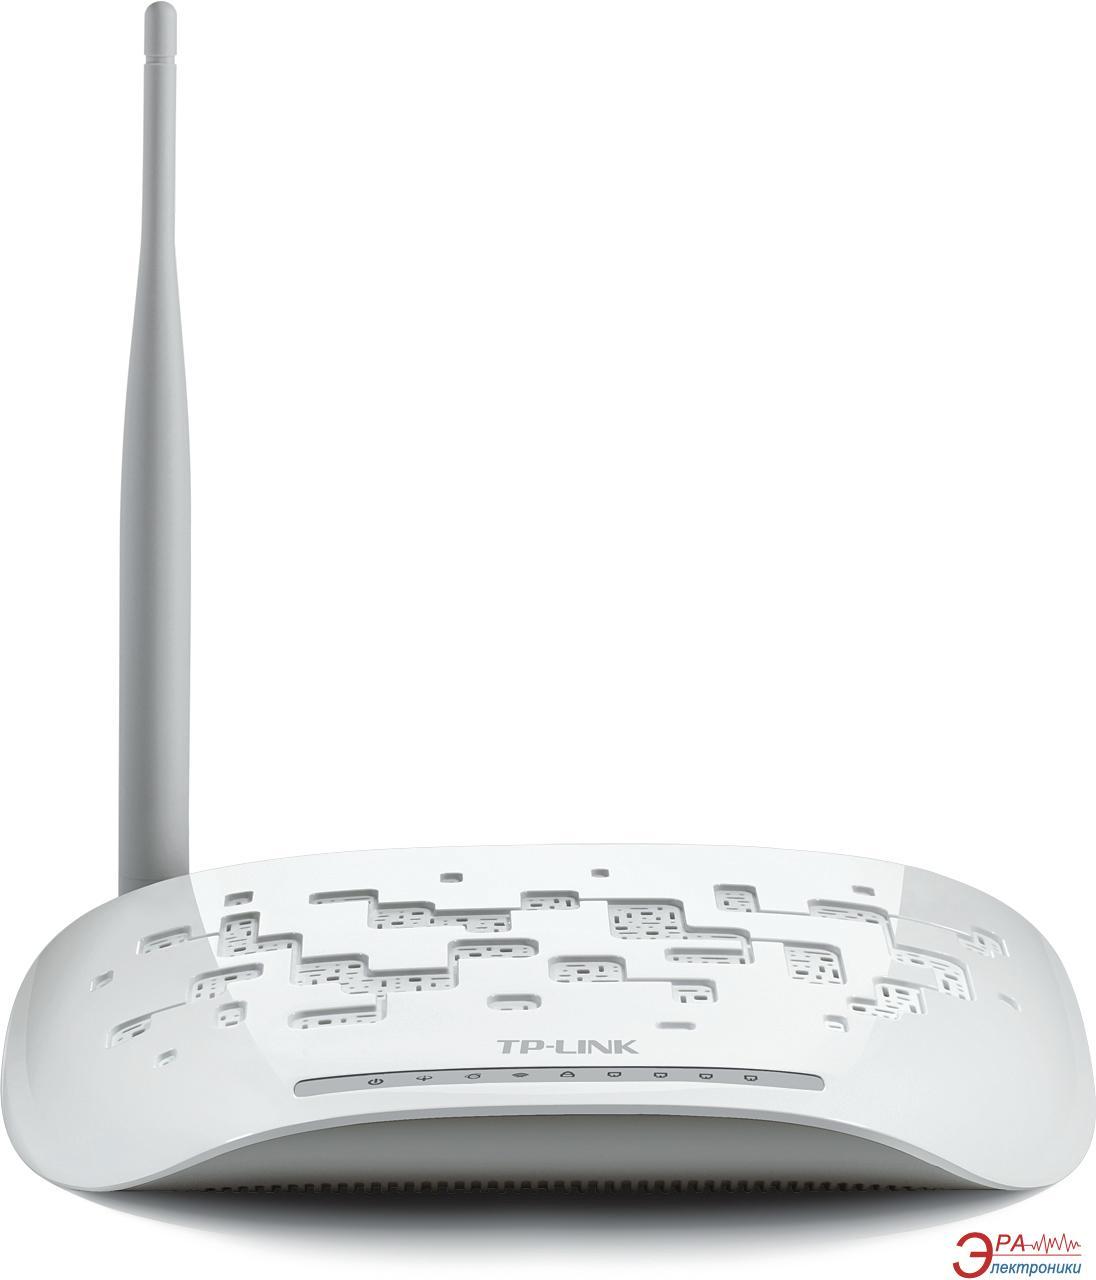 ADSL-модем TP-LINK TD-W8951ND